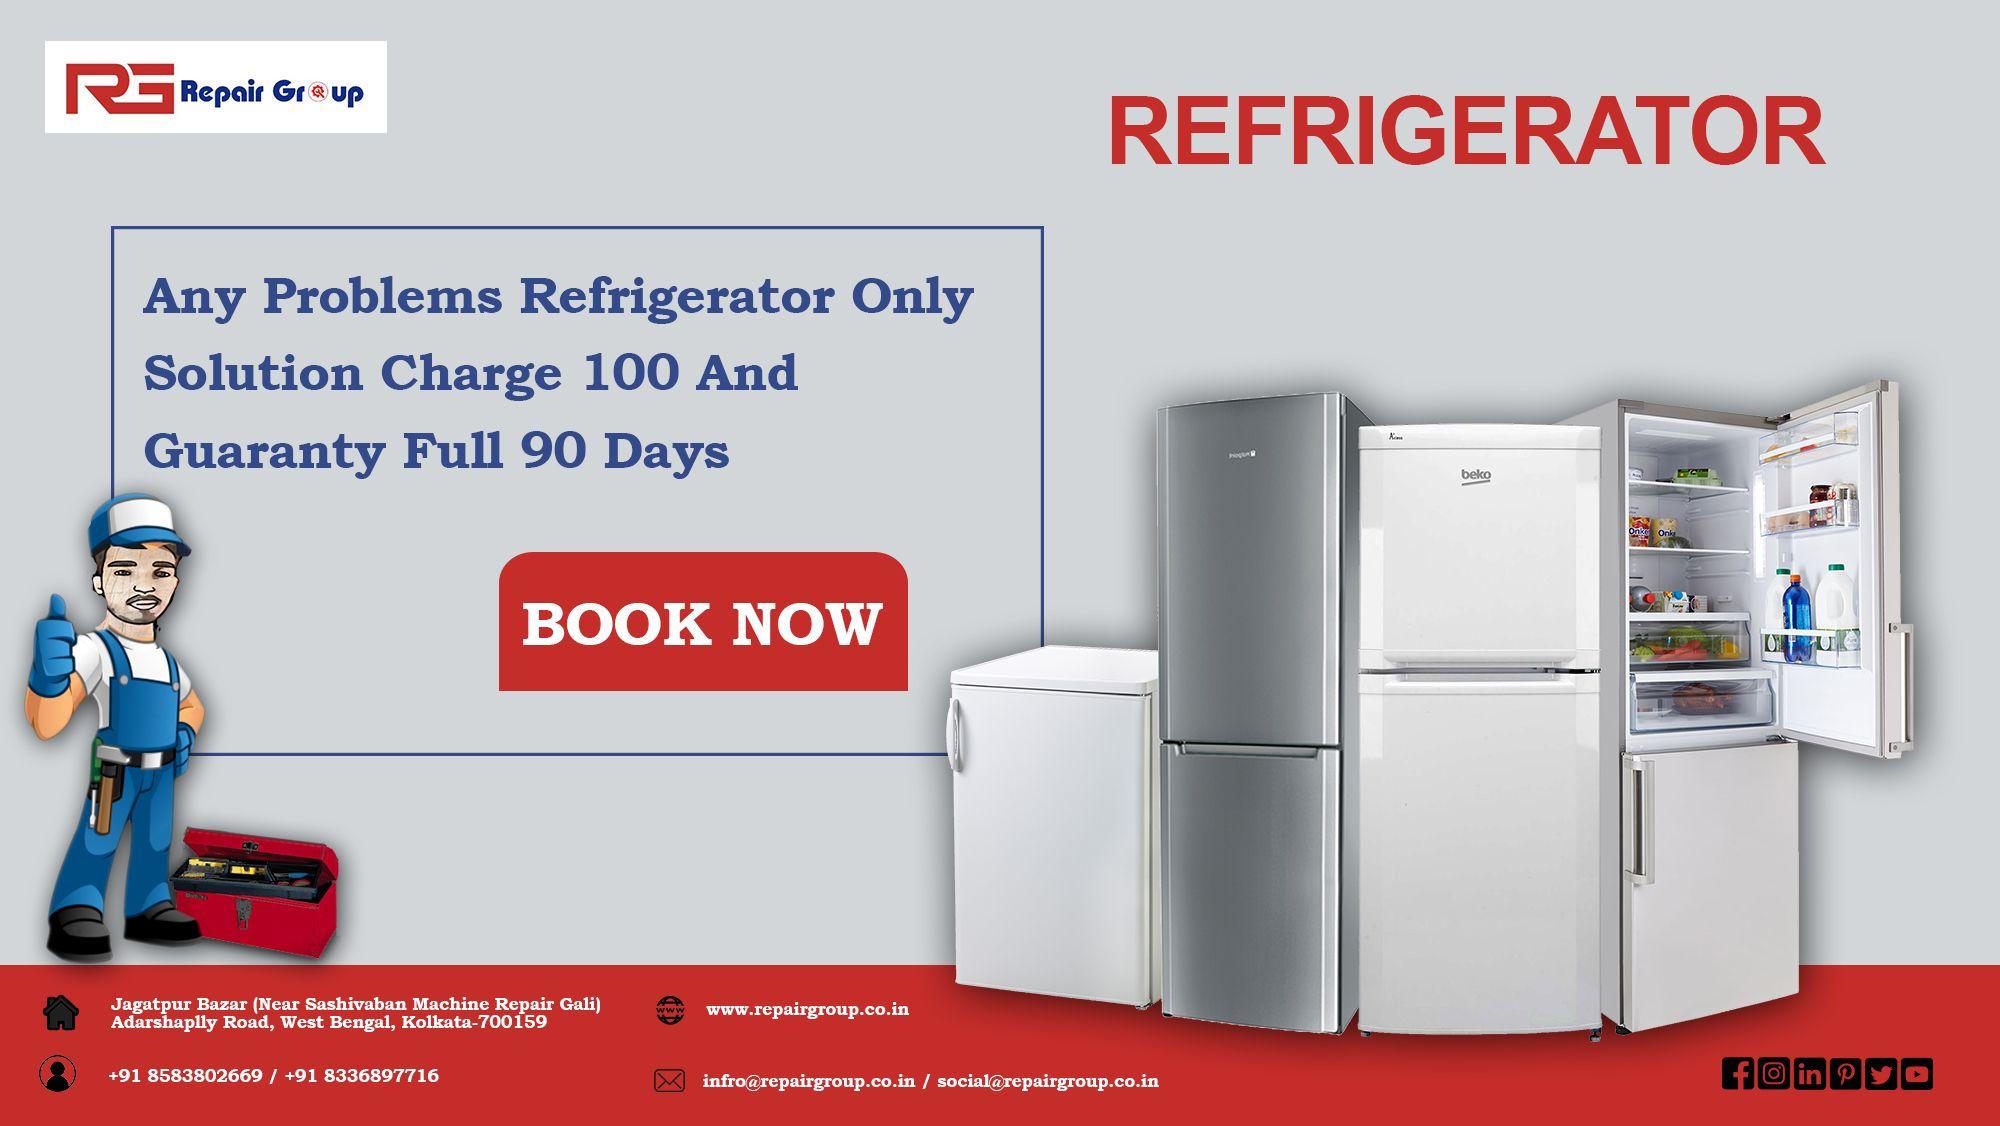 Refrigerator Repair Service Near Me Refrigerator Repair Refrigerator Repair Service Repair